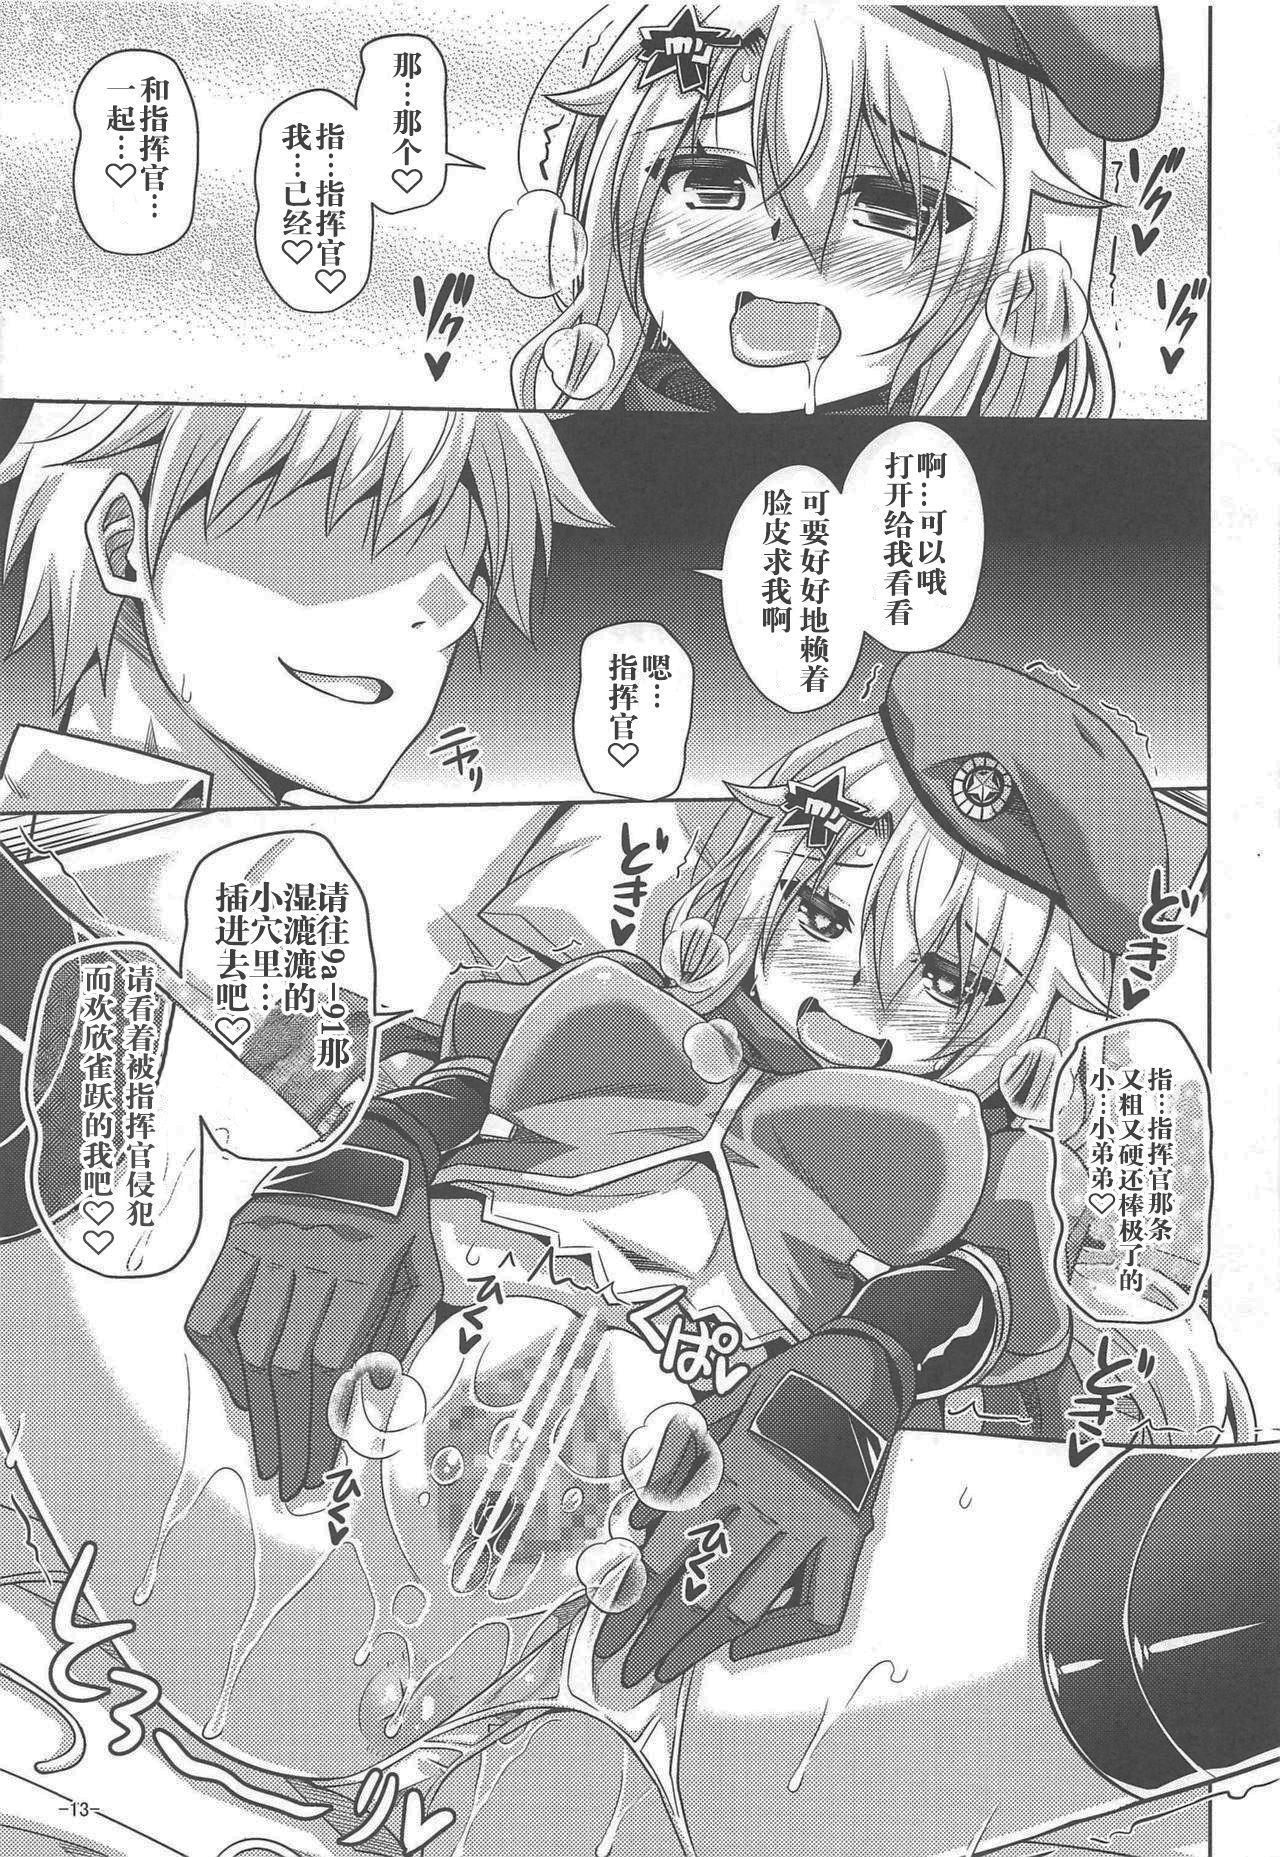 (C95) [Dokomademo Aoi Sora ni Ukabu Niku. (Nikusoukyuu.)] 9a-91-chan wa Miraretai. (Girls' Frontline) [Chinese] [v.v.t.m汉化组] 12